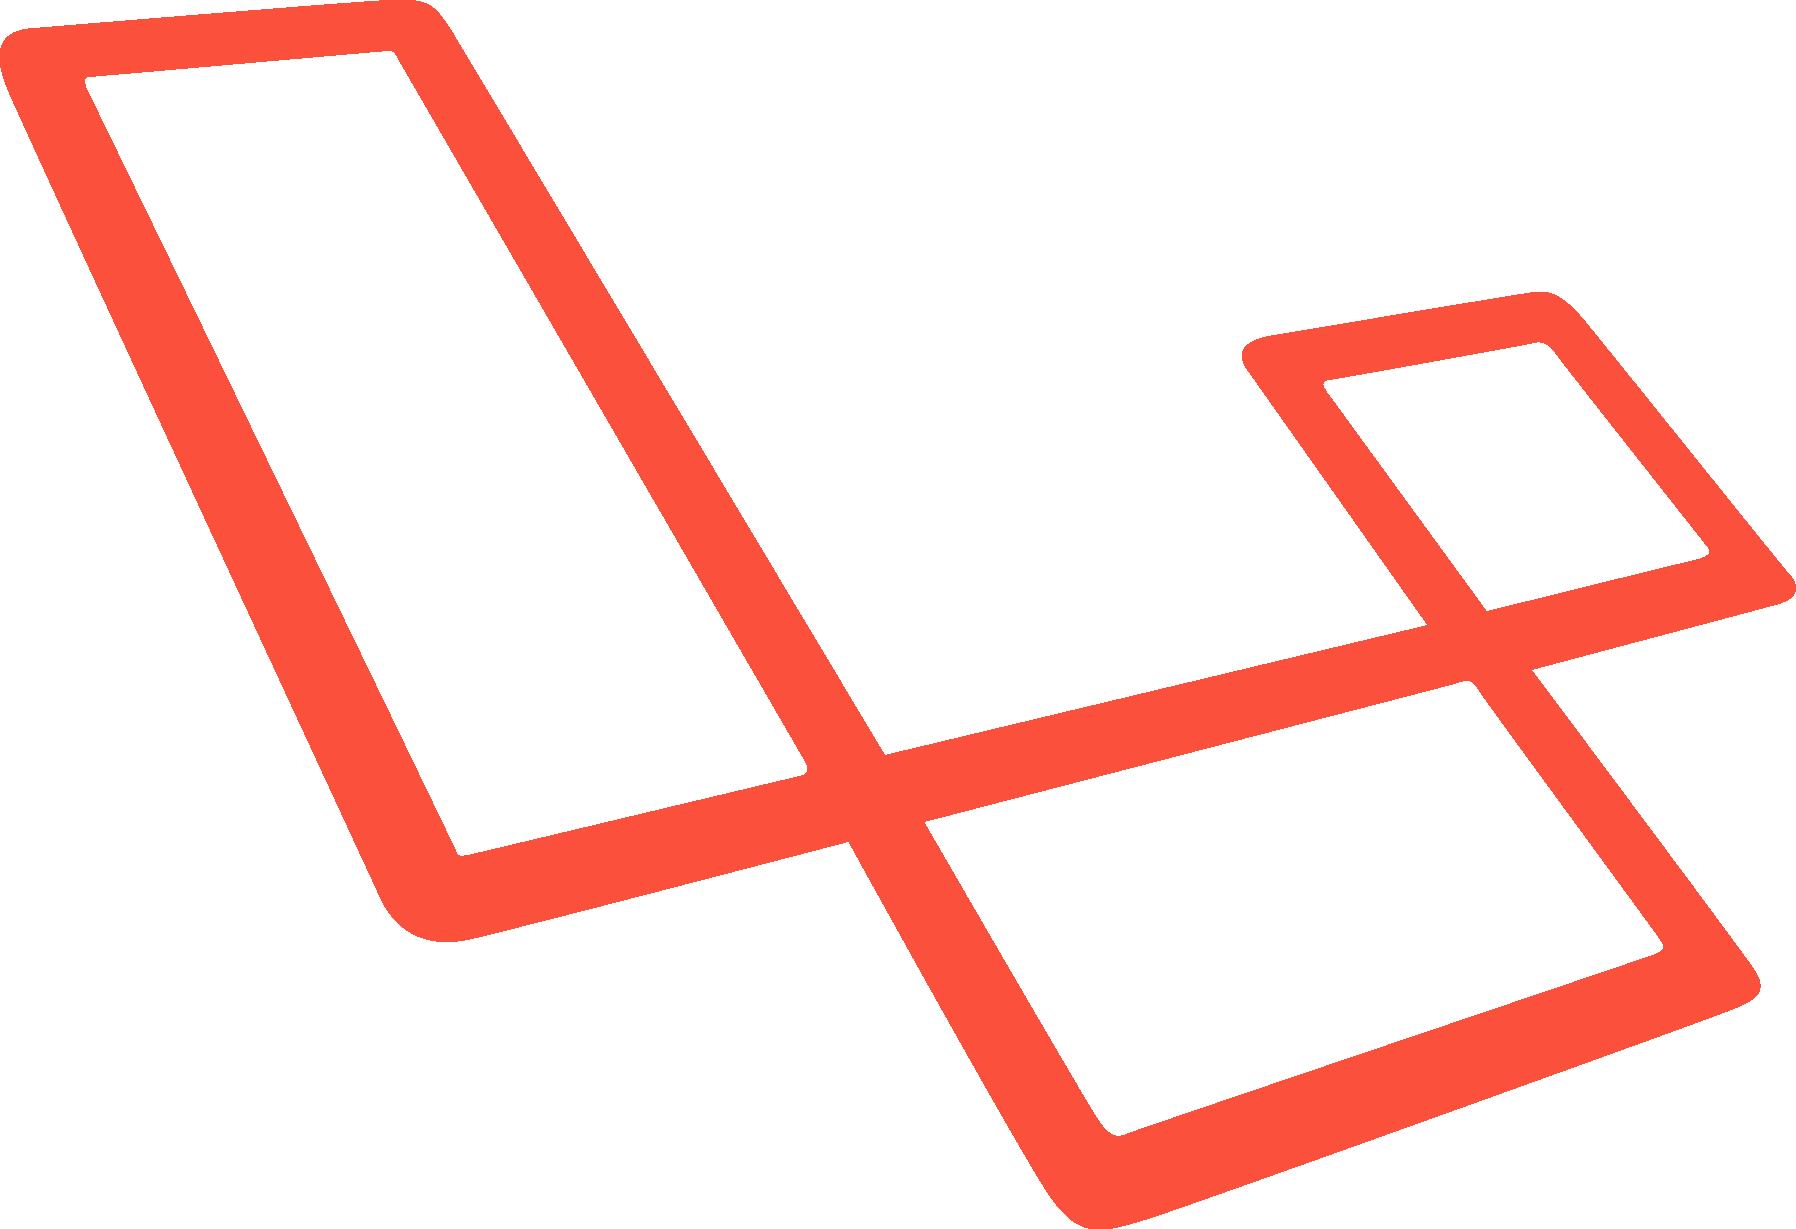 Laravelでバージョンを指定してインストールする方法